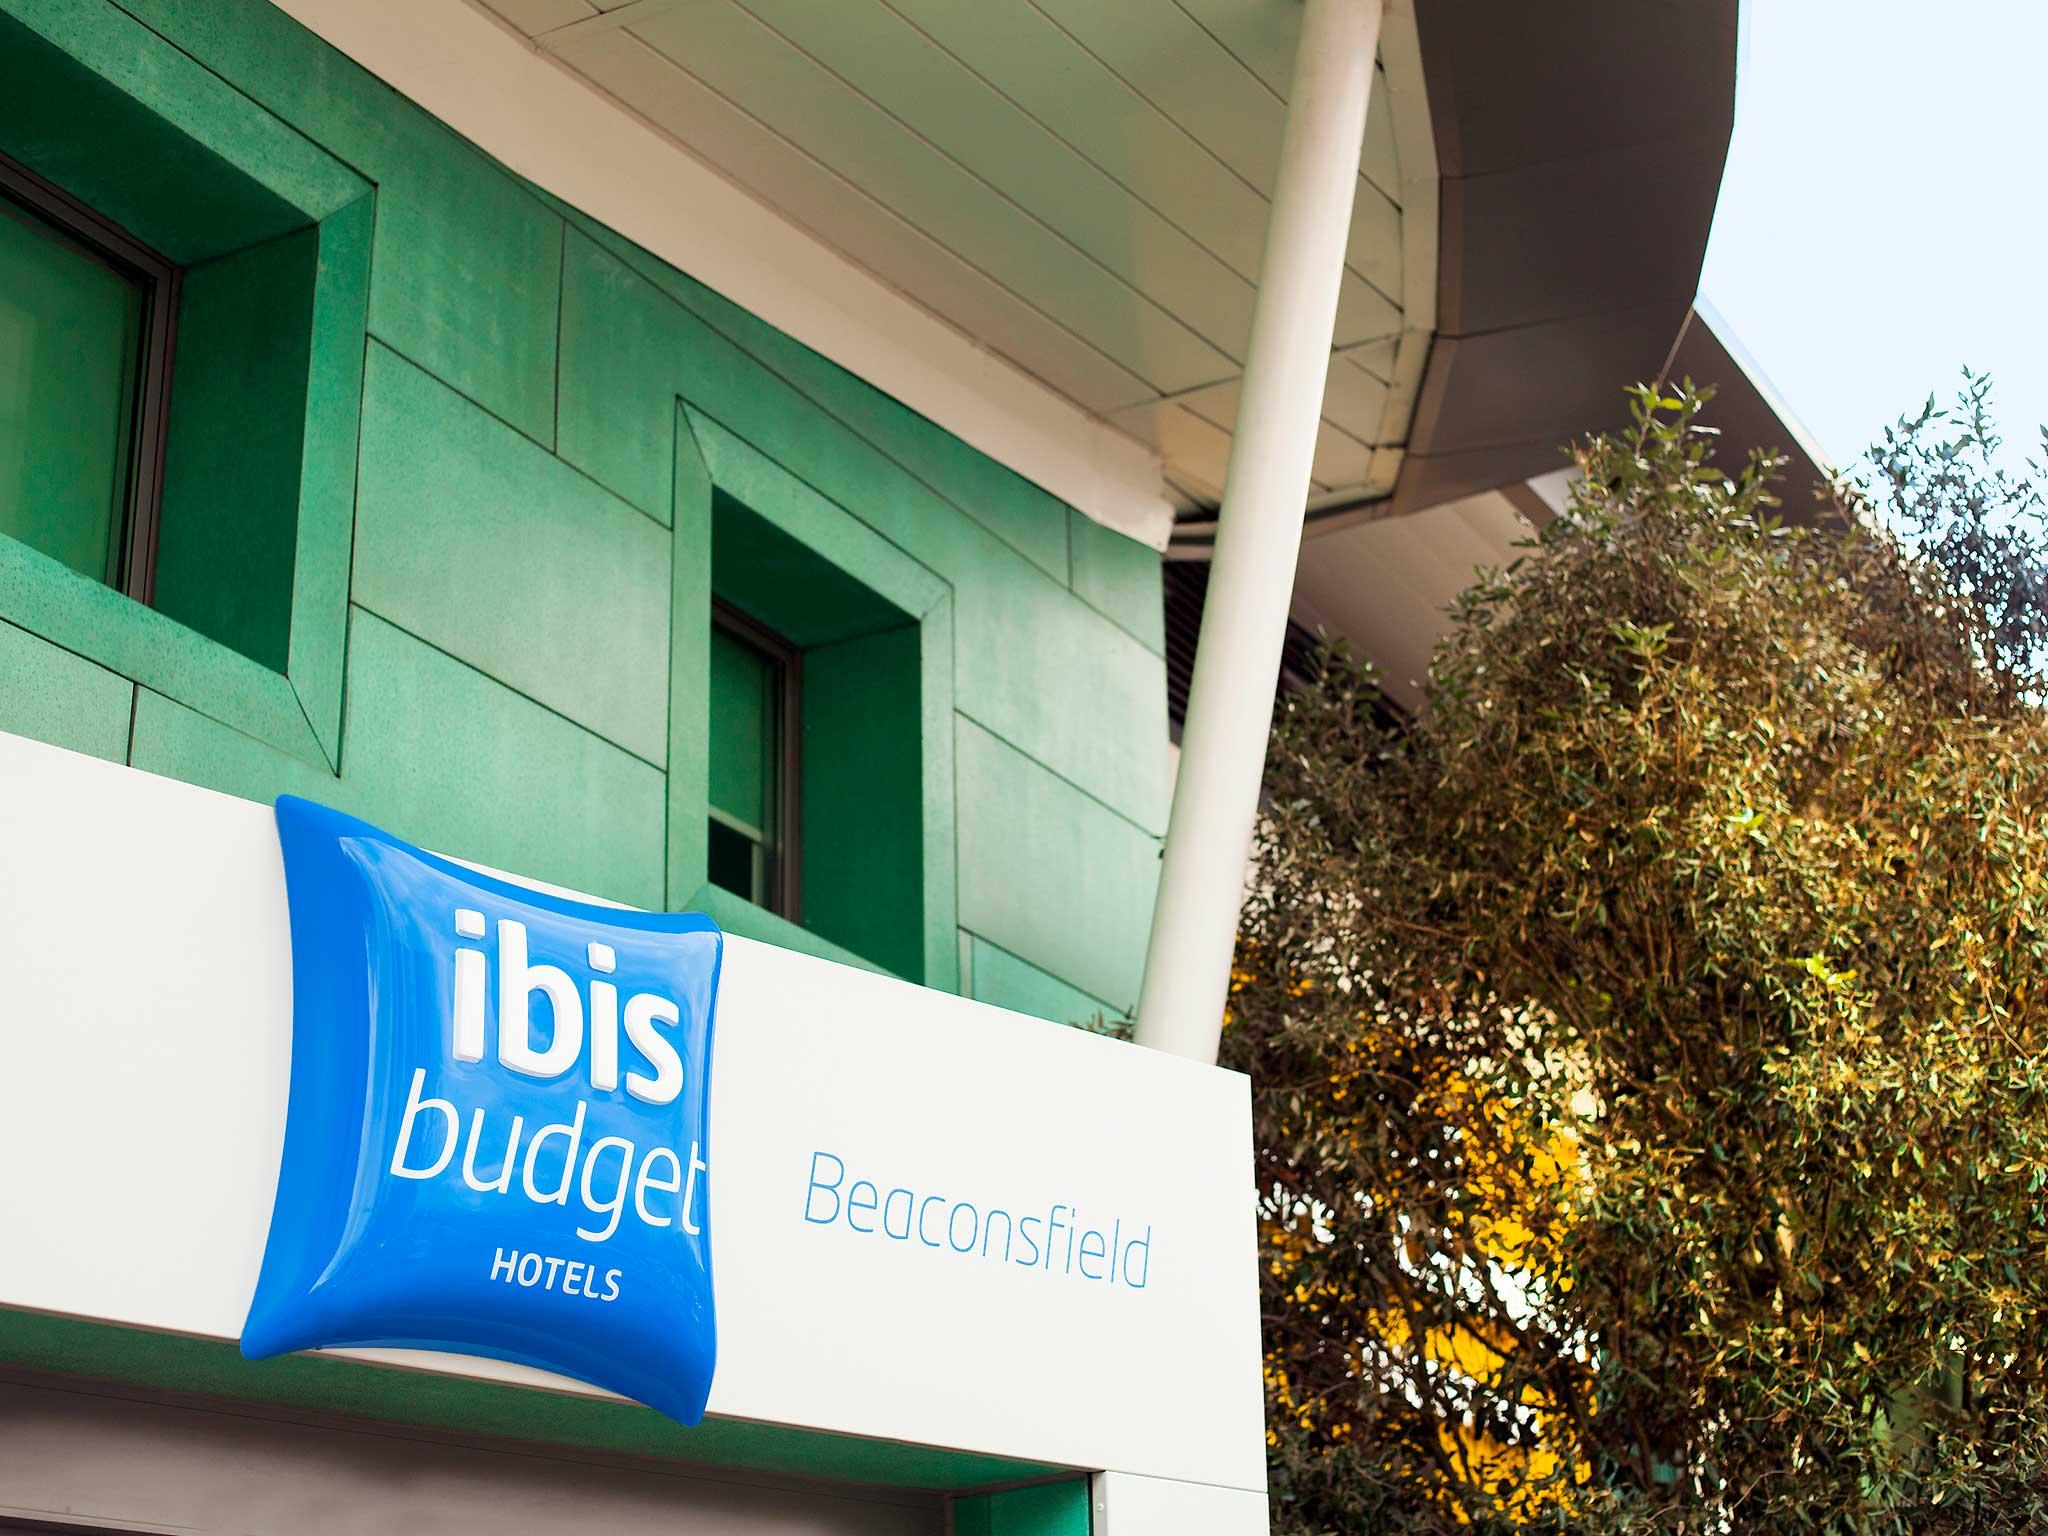 Otel – ibis budget Beaconsfield